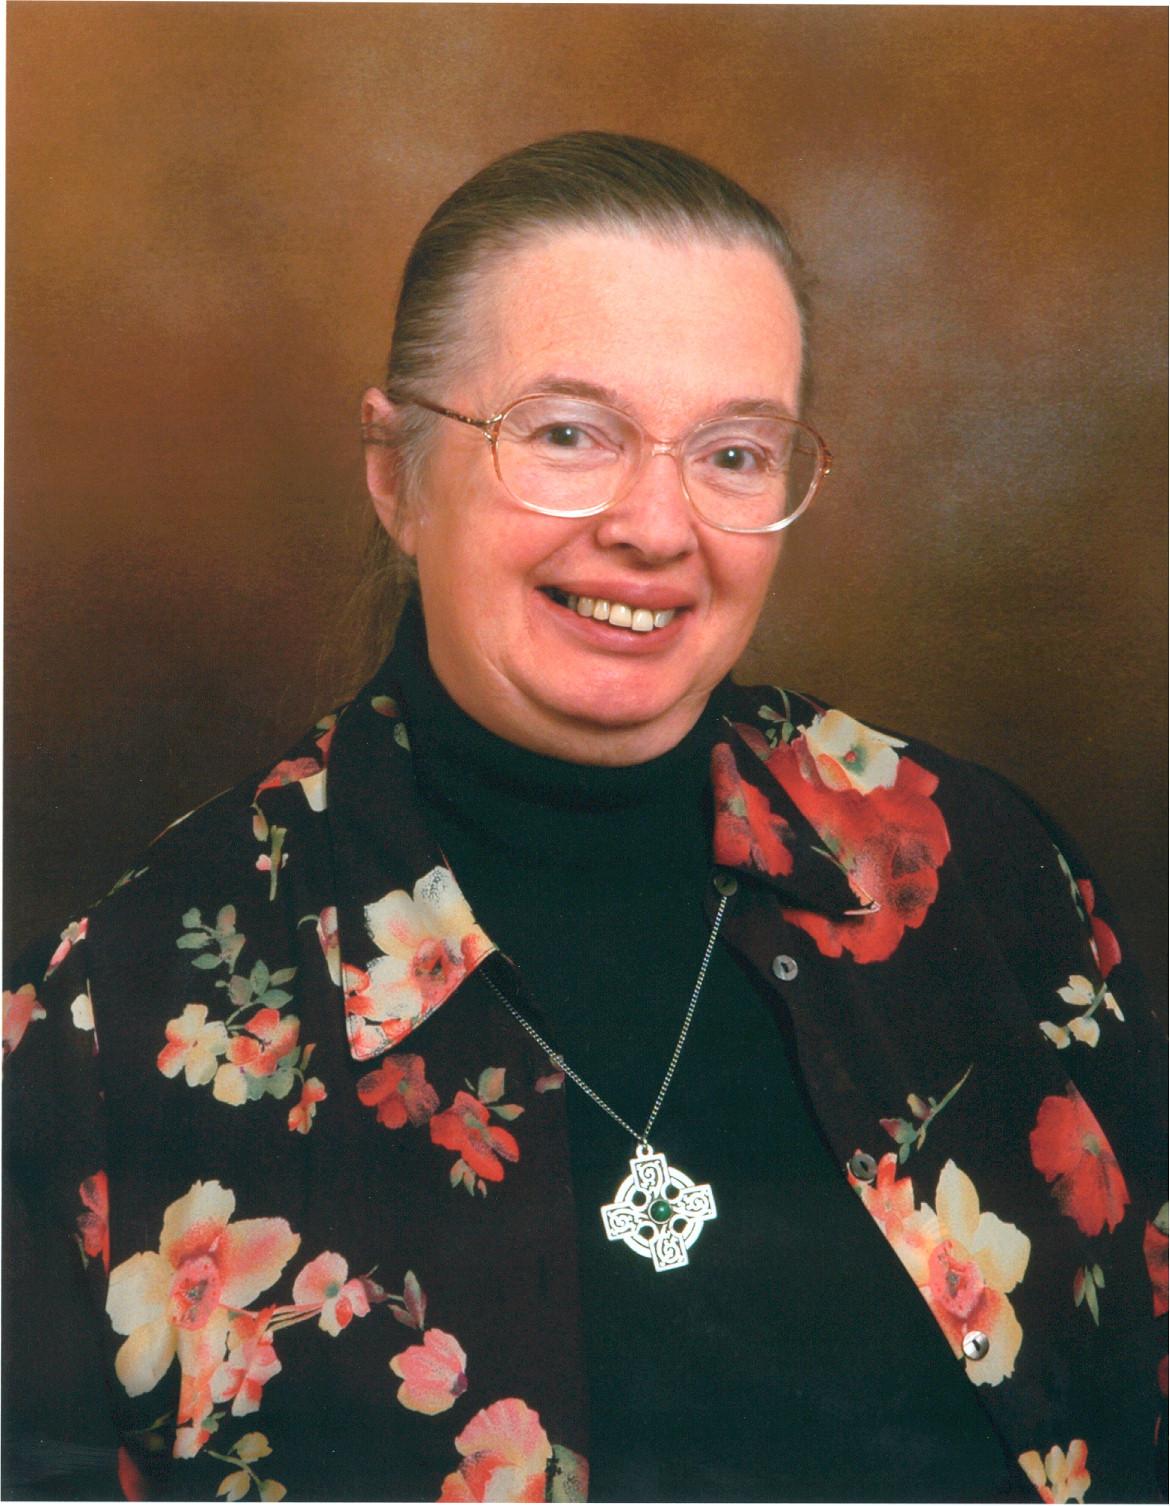 Professor Jean Golding